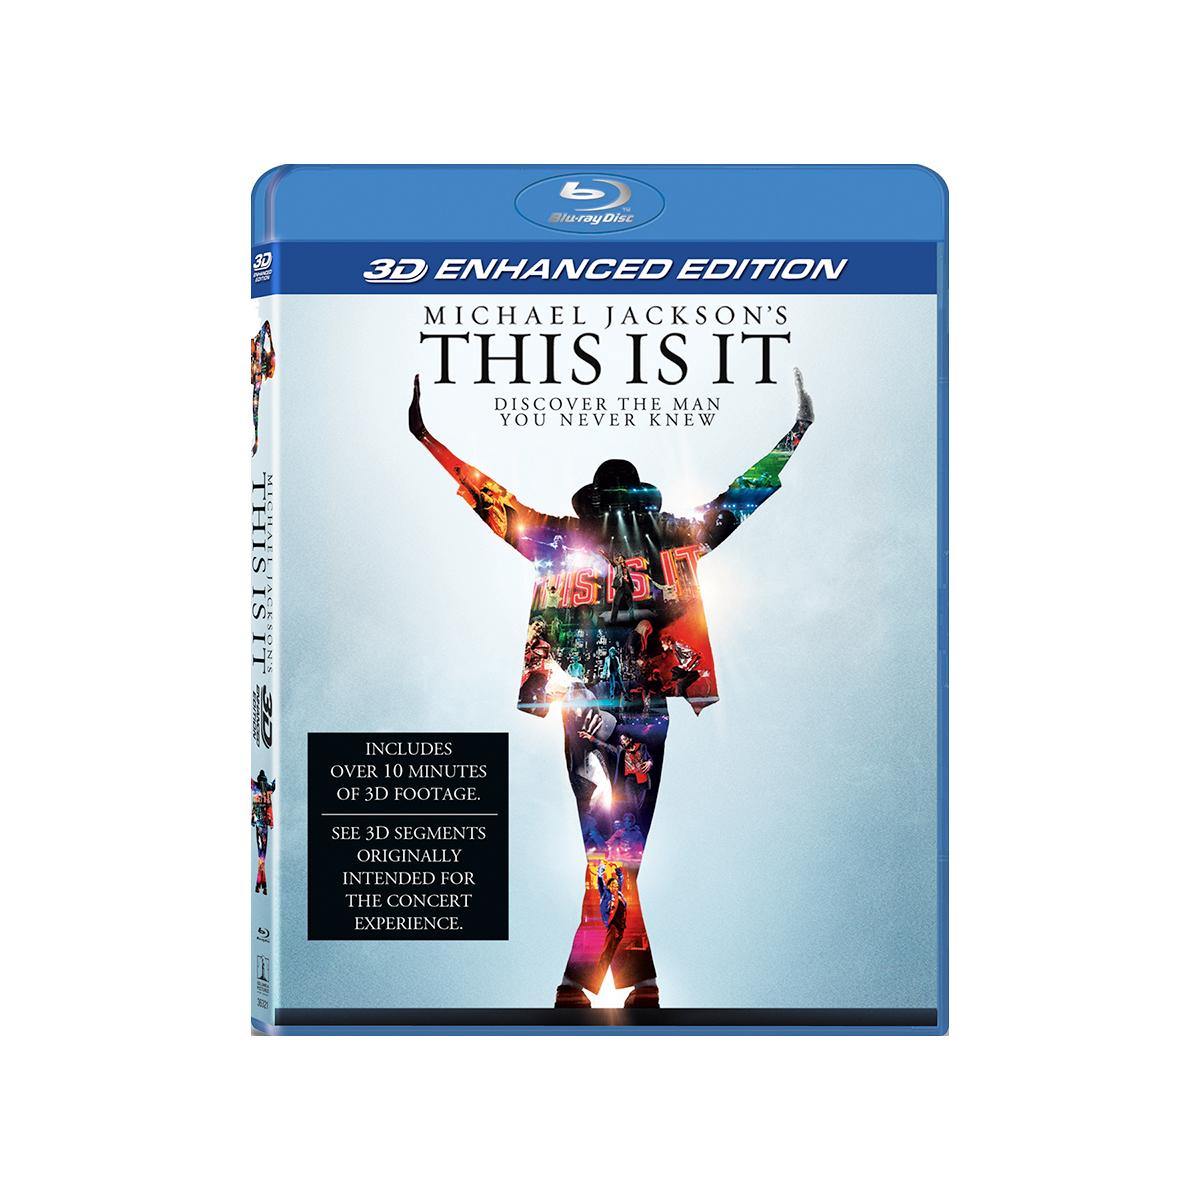 Michael Jackson's This Is It 10th Anniversary Box Set